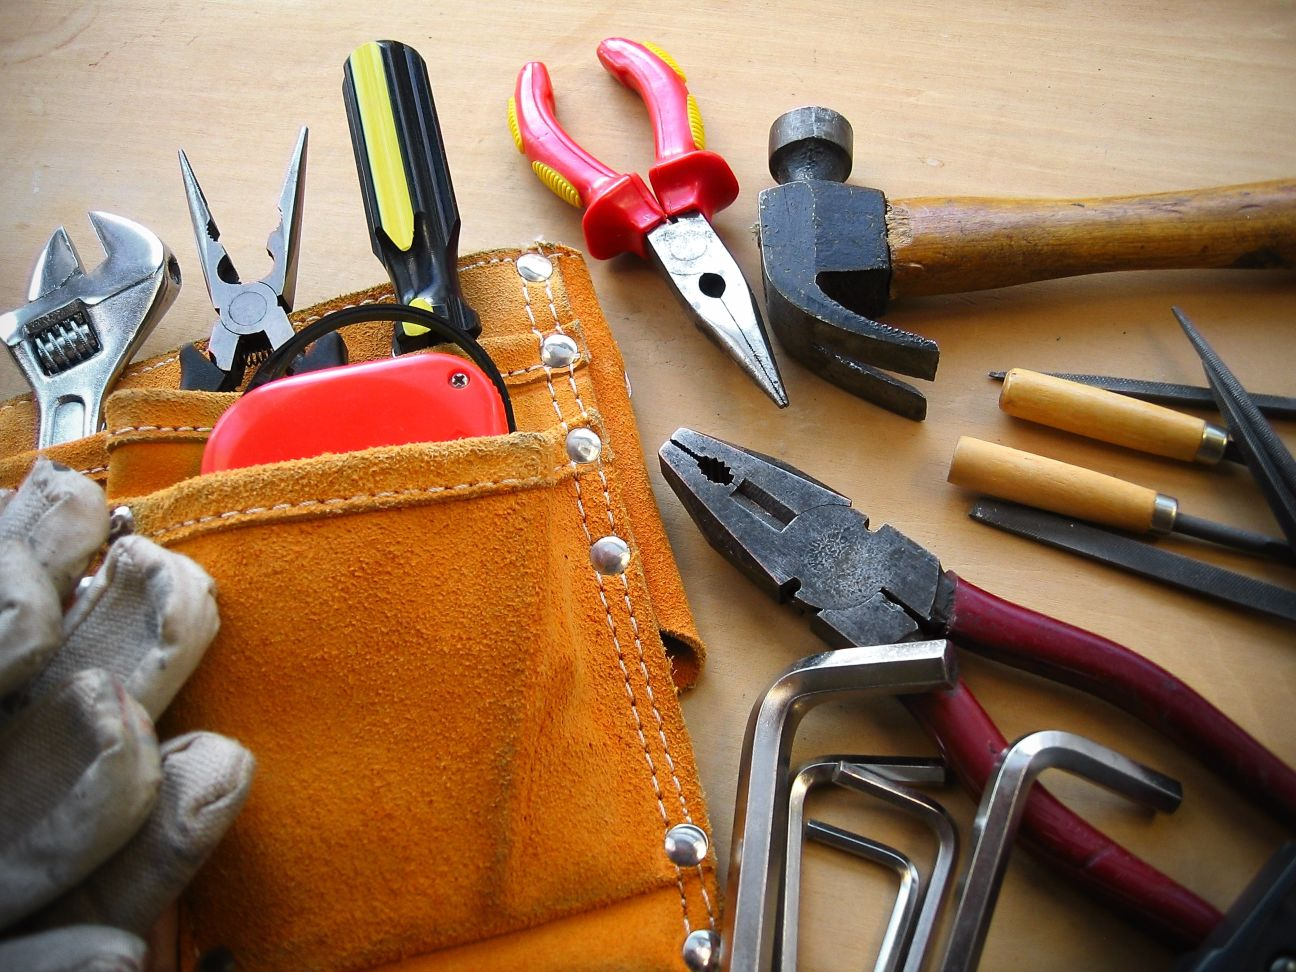 best-tools-hand-memphis-tn-usa